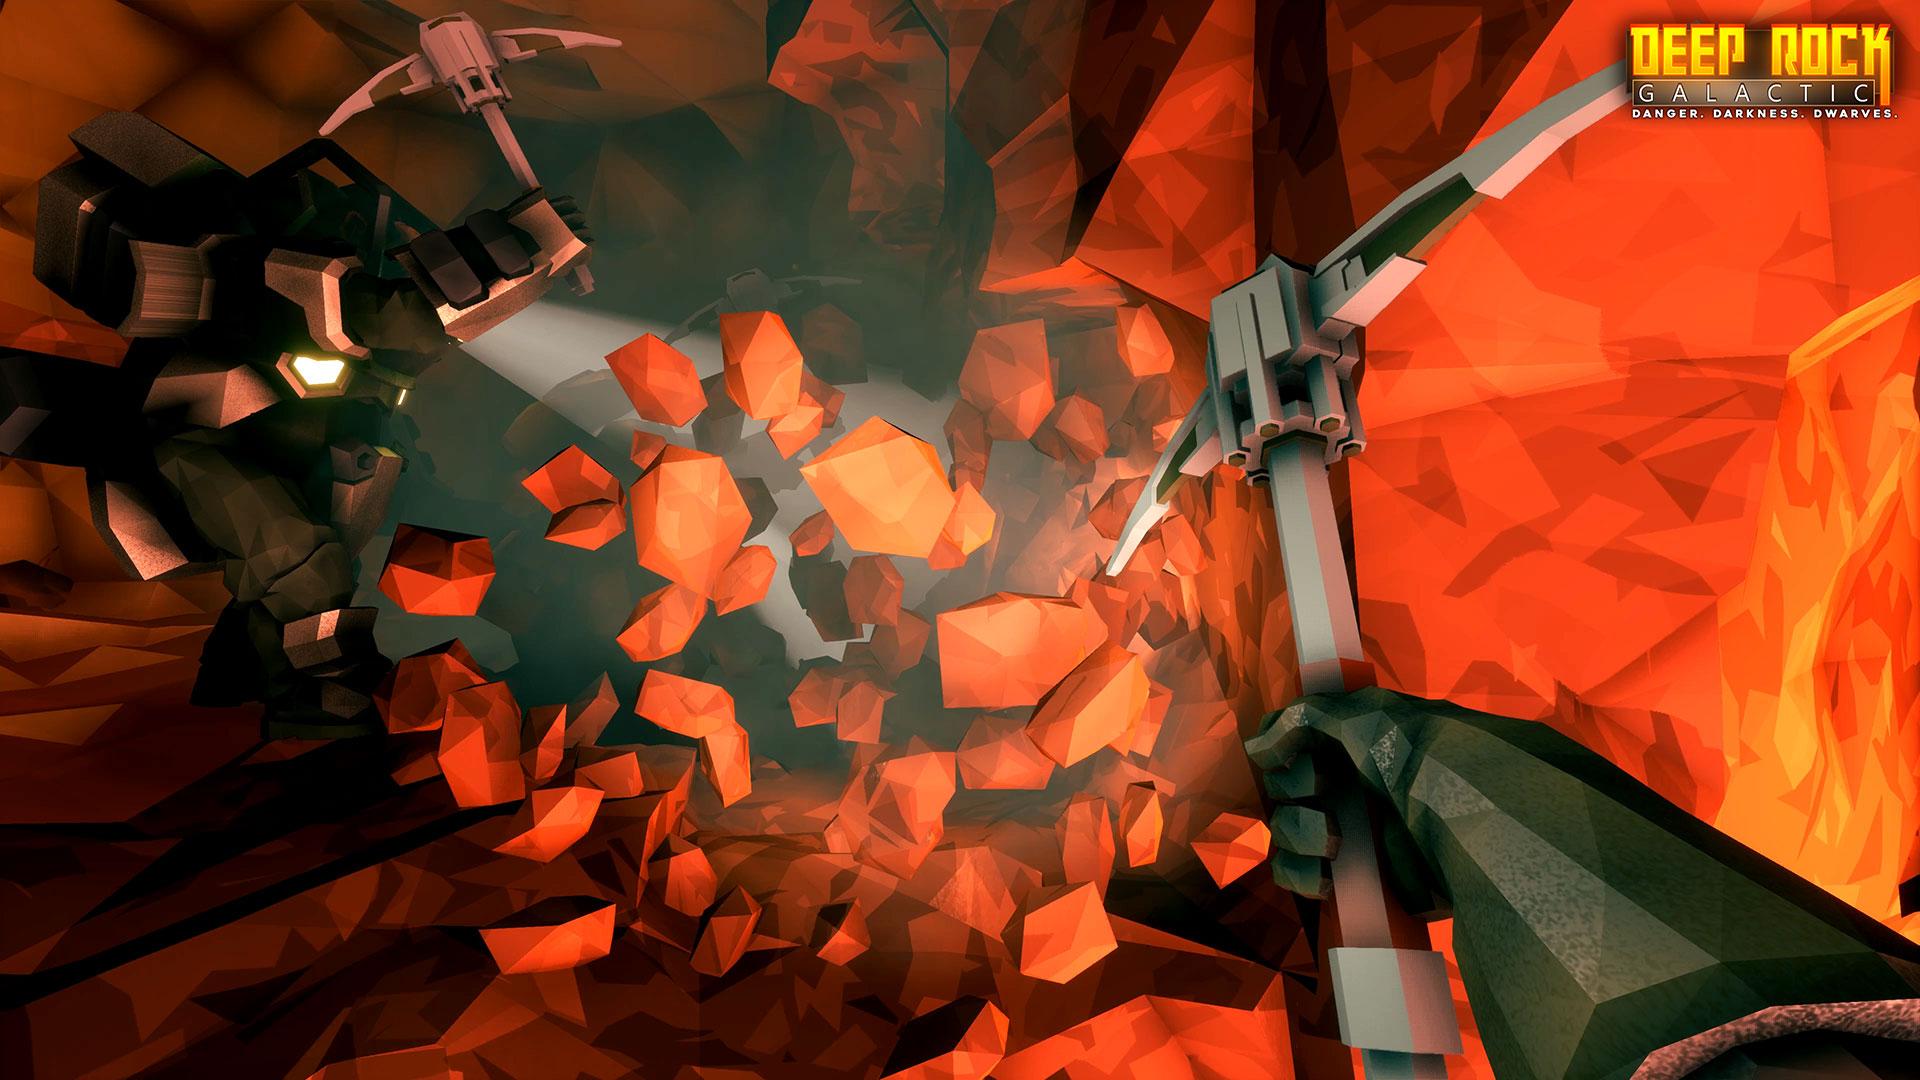 DeepRockGalactic_DRG_005-Pickaxe_Mining.jpg